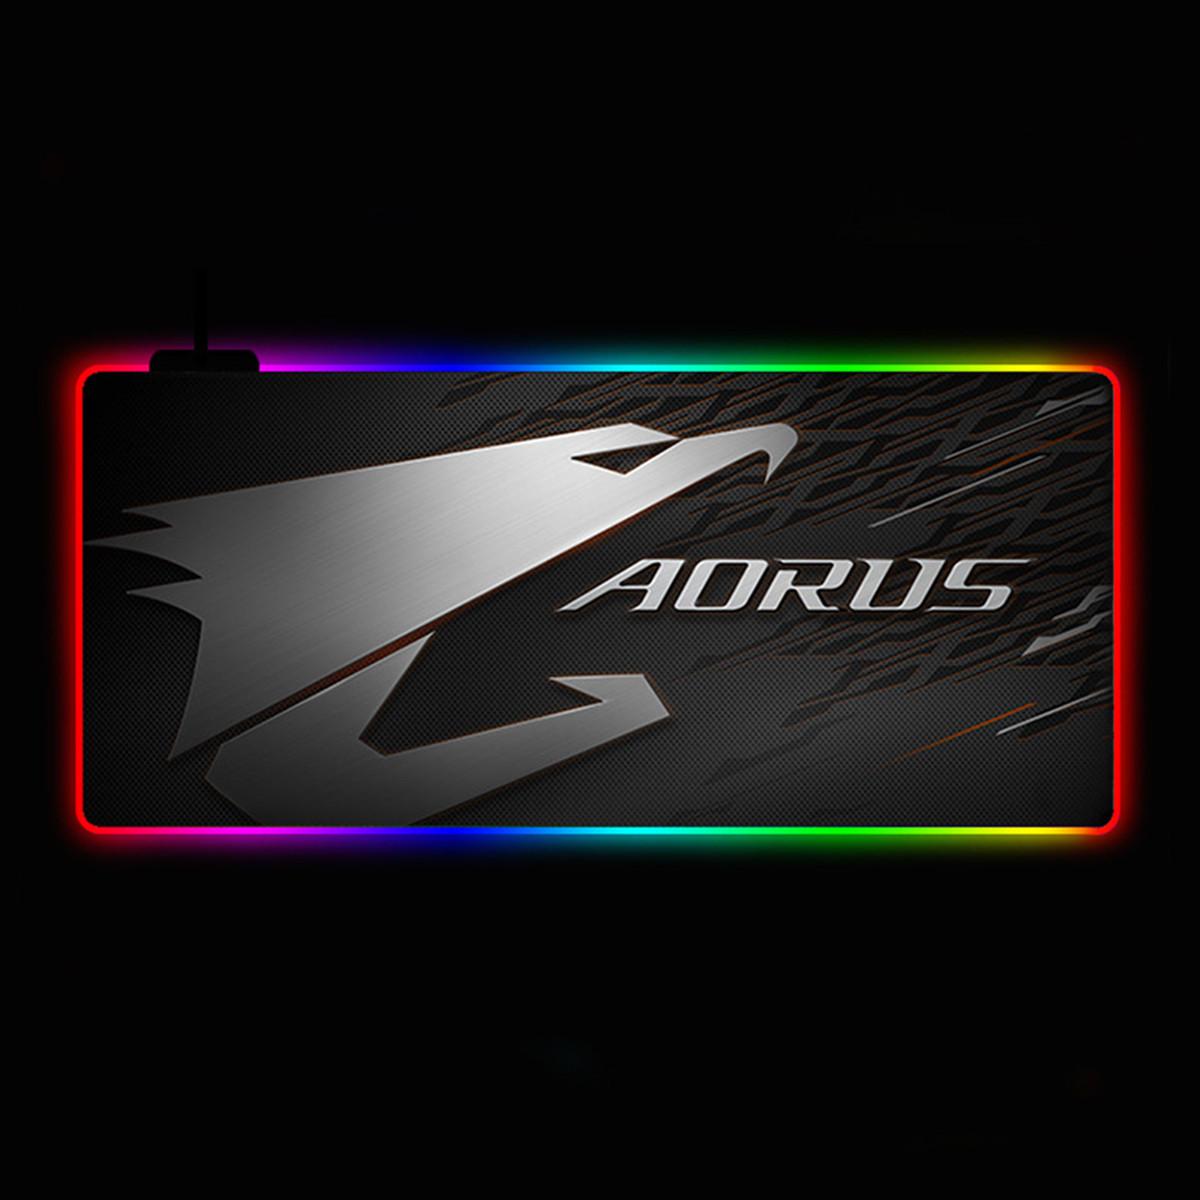 Геймерский коврик для мышки SKY (GMS-WT 9040/101) RGB подсветка 90x40 см